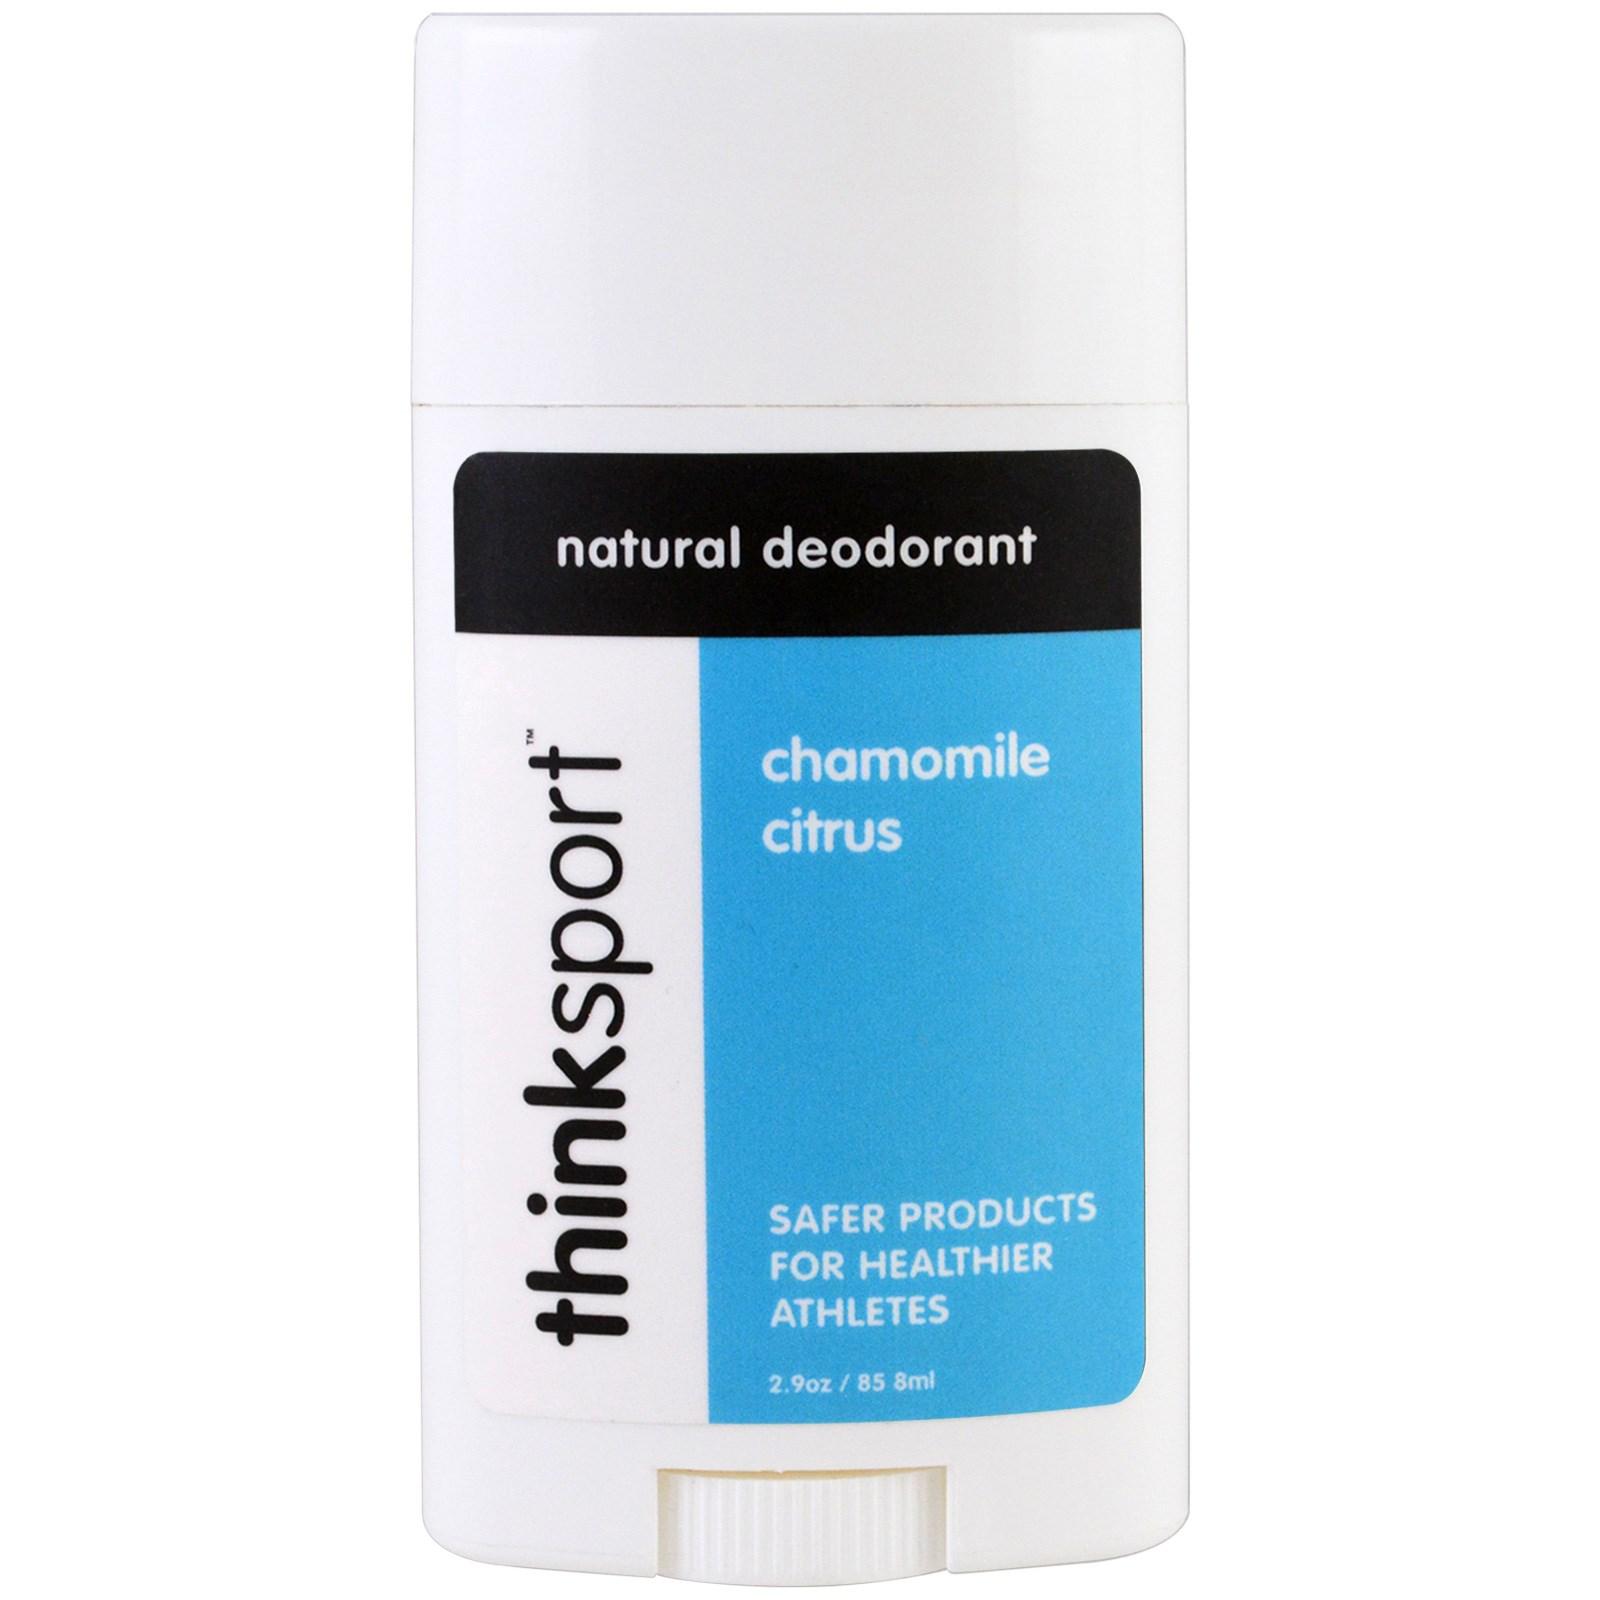 Think, Thinksport, натуральный дезодорант, ромашка и цитрус, 2,9 унц. (85,8 мл)